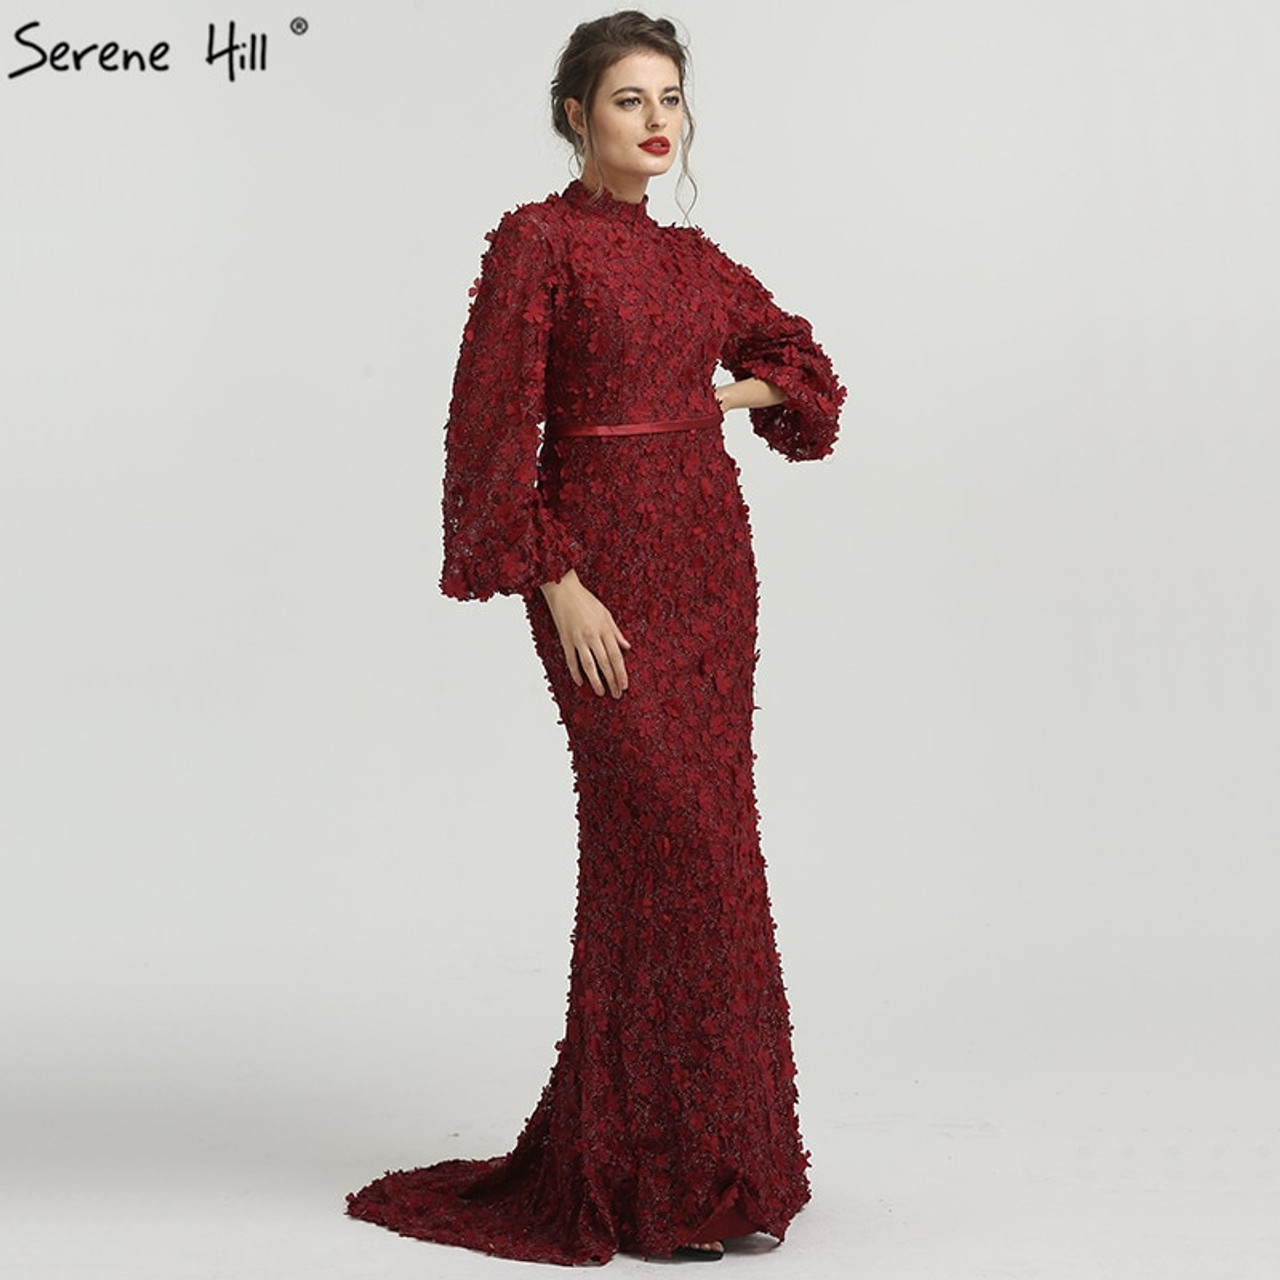 8c13007df3 ... Flowers Pearls Long Sleeves Mermaid Evening Dresses Muslim Fashion  Elegant Tulle Evening Gowns 2019 Serene Hill ...